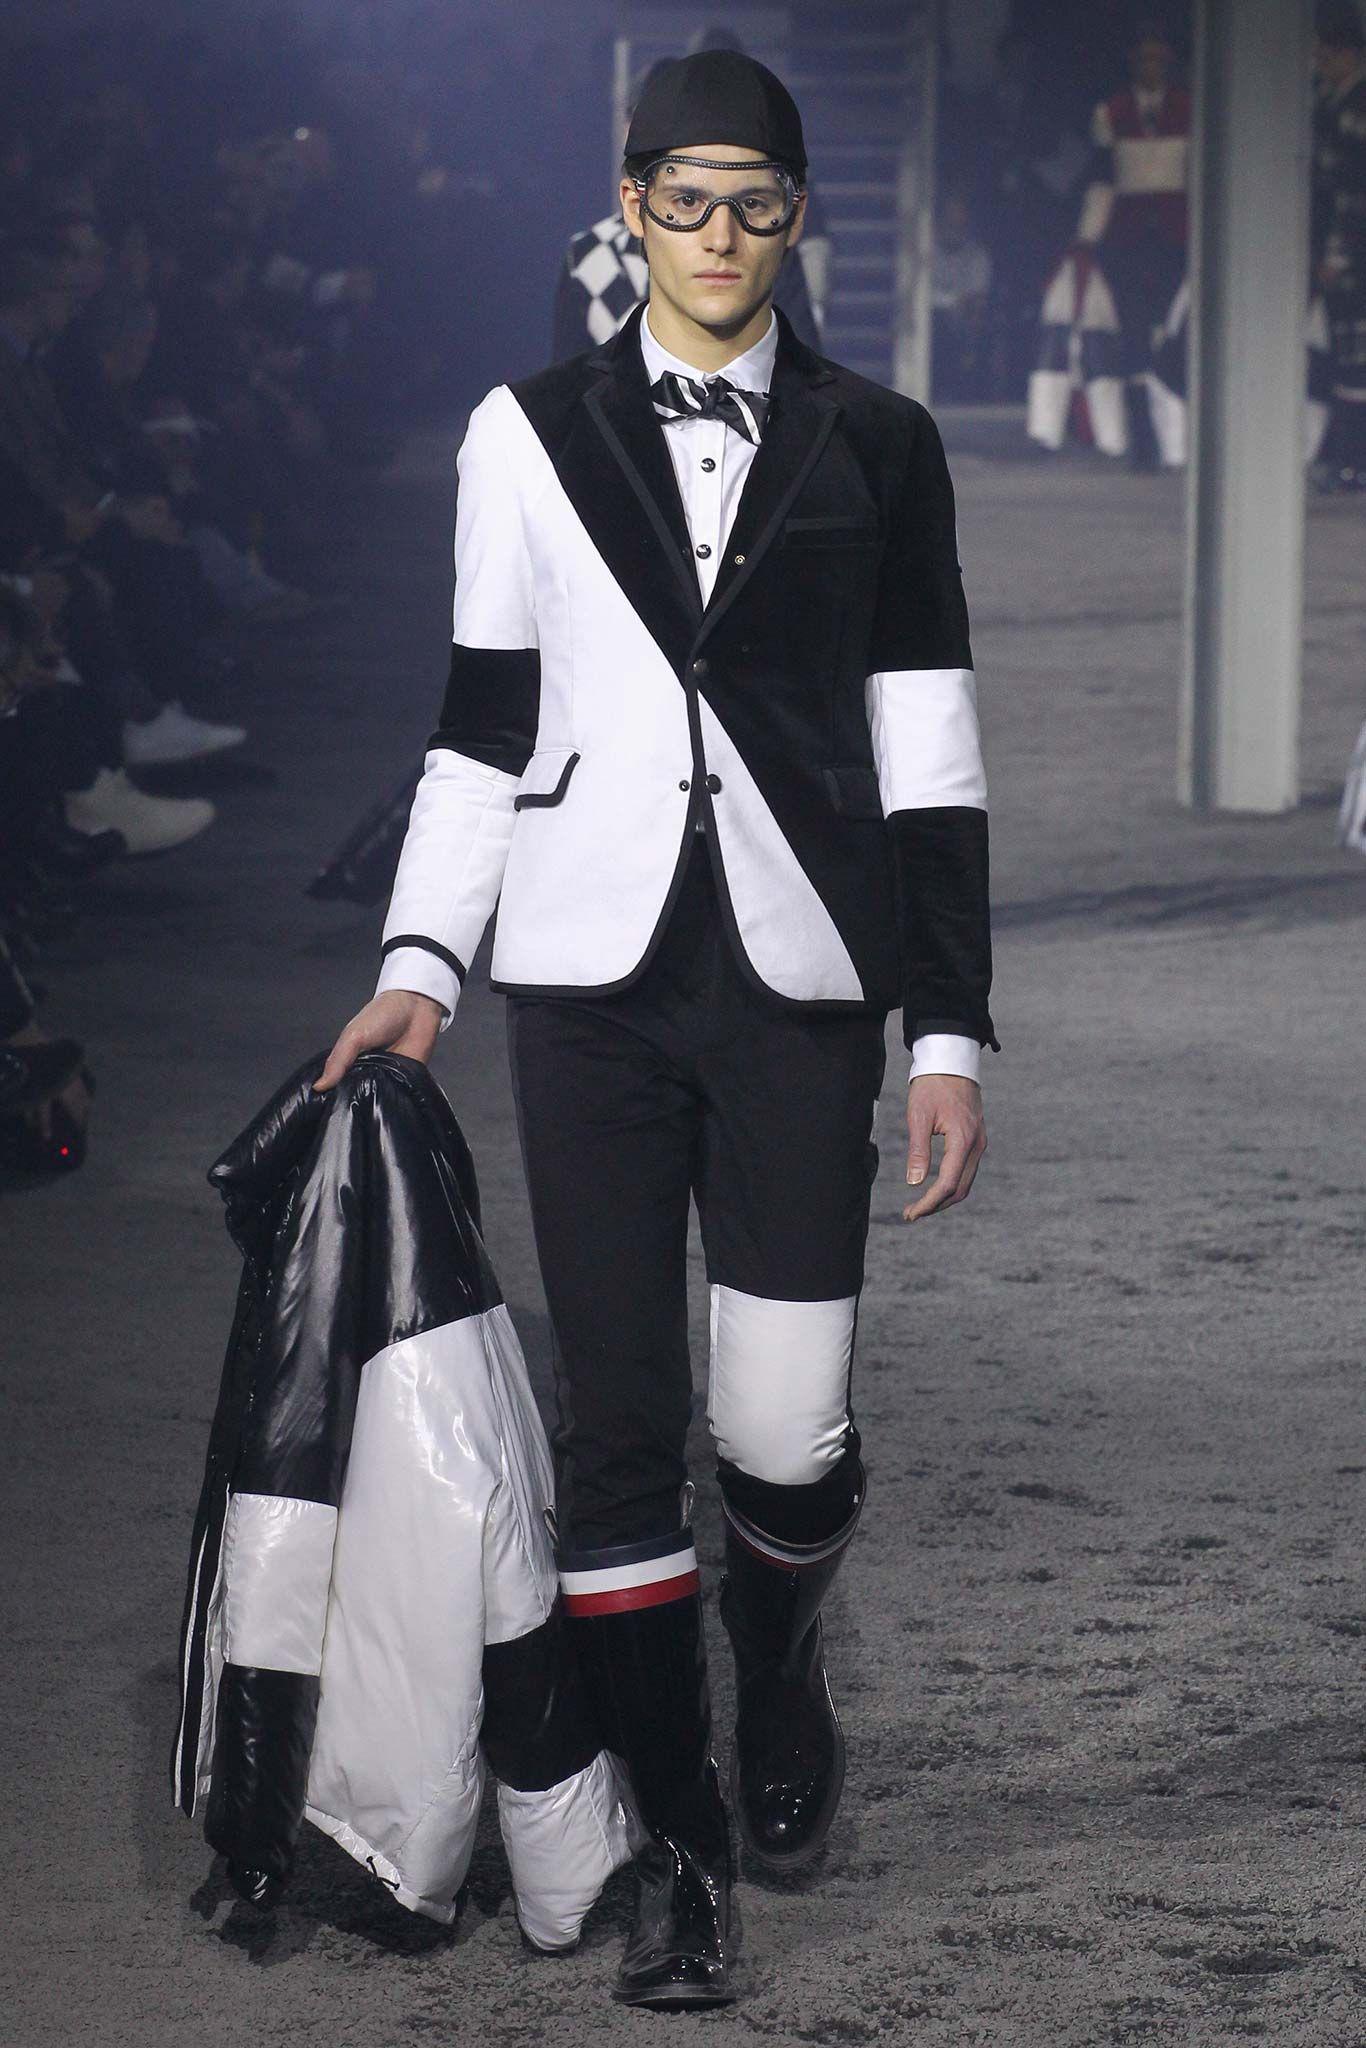 Moncler Gamme Bleu - Fall 2015 Menswear